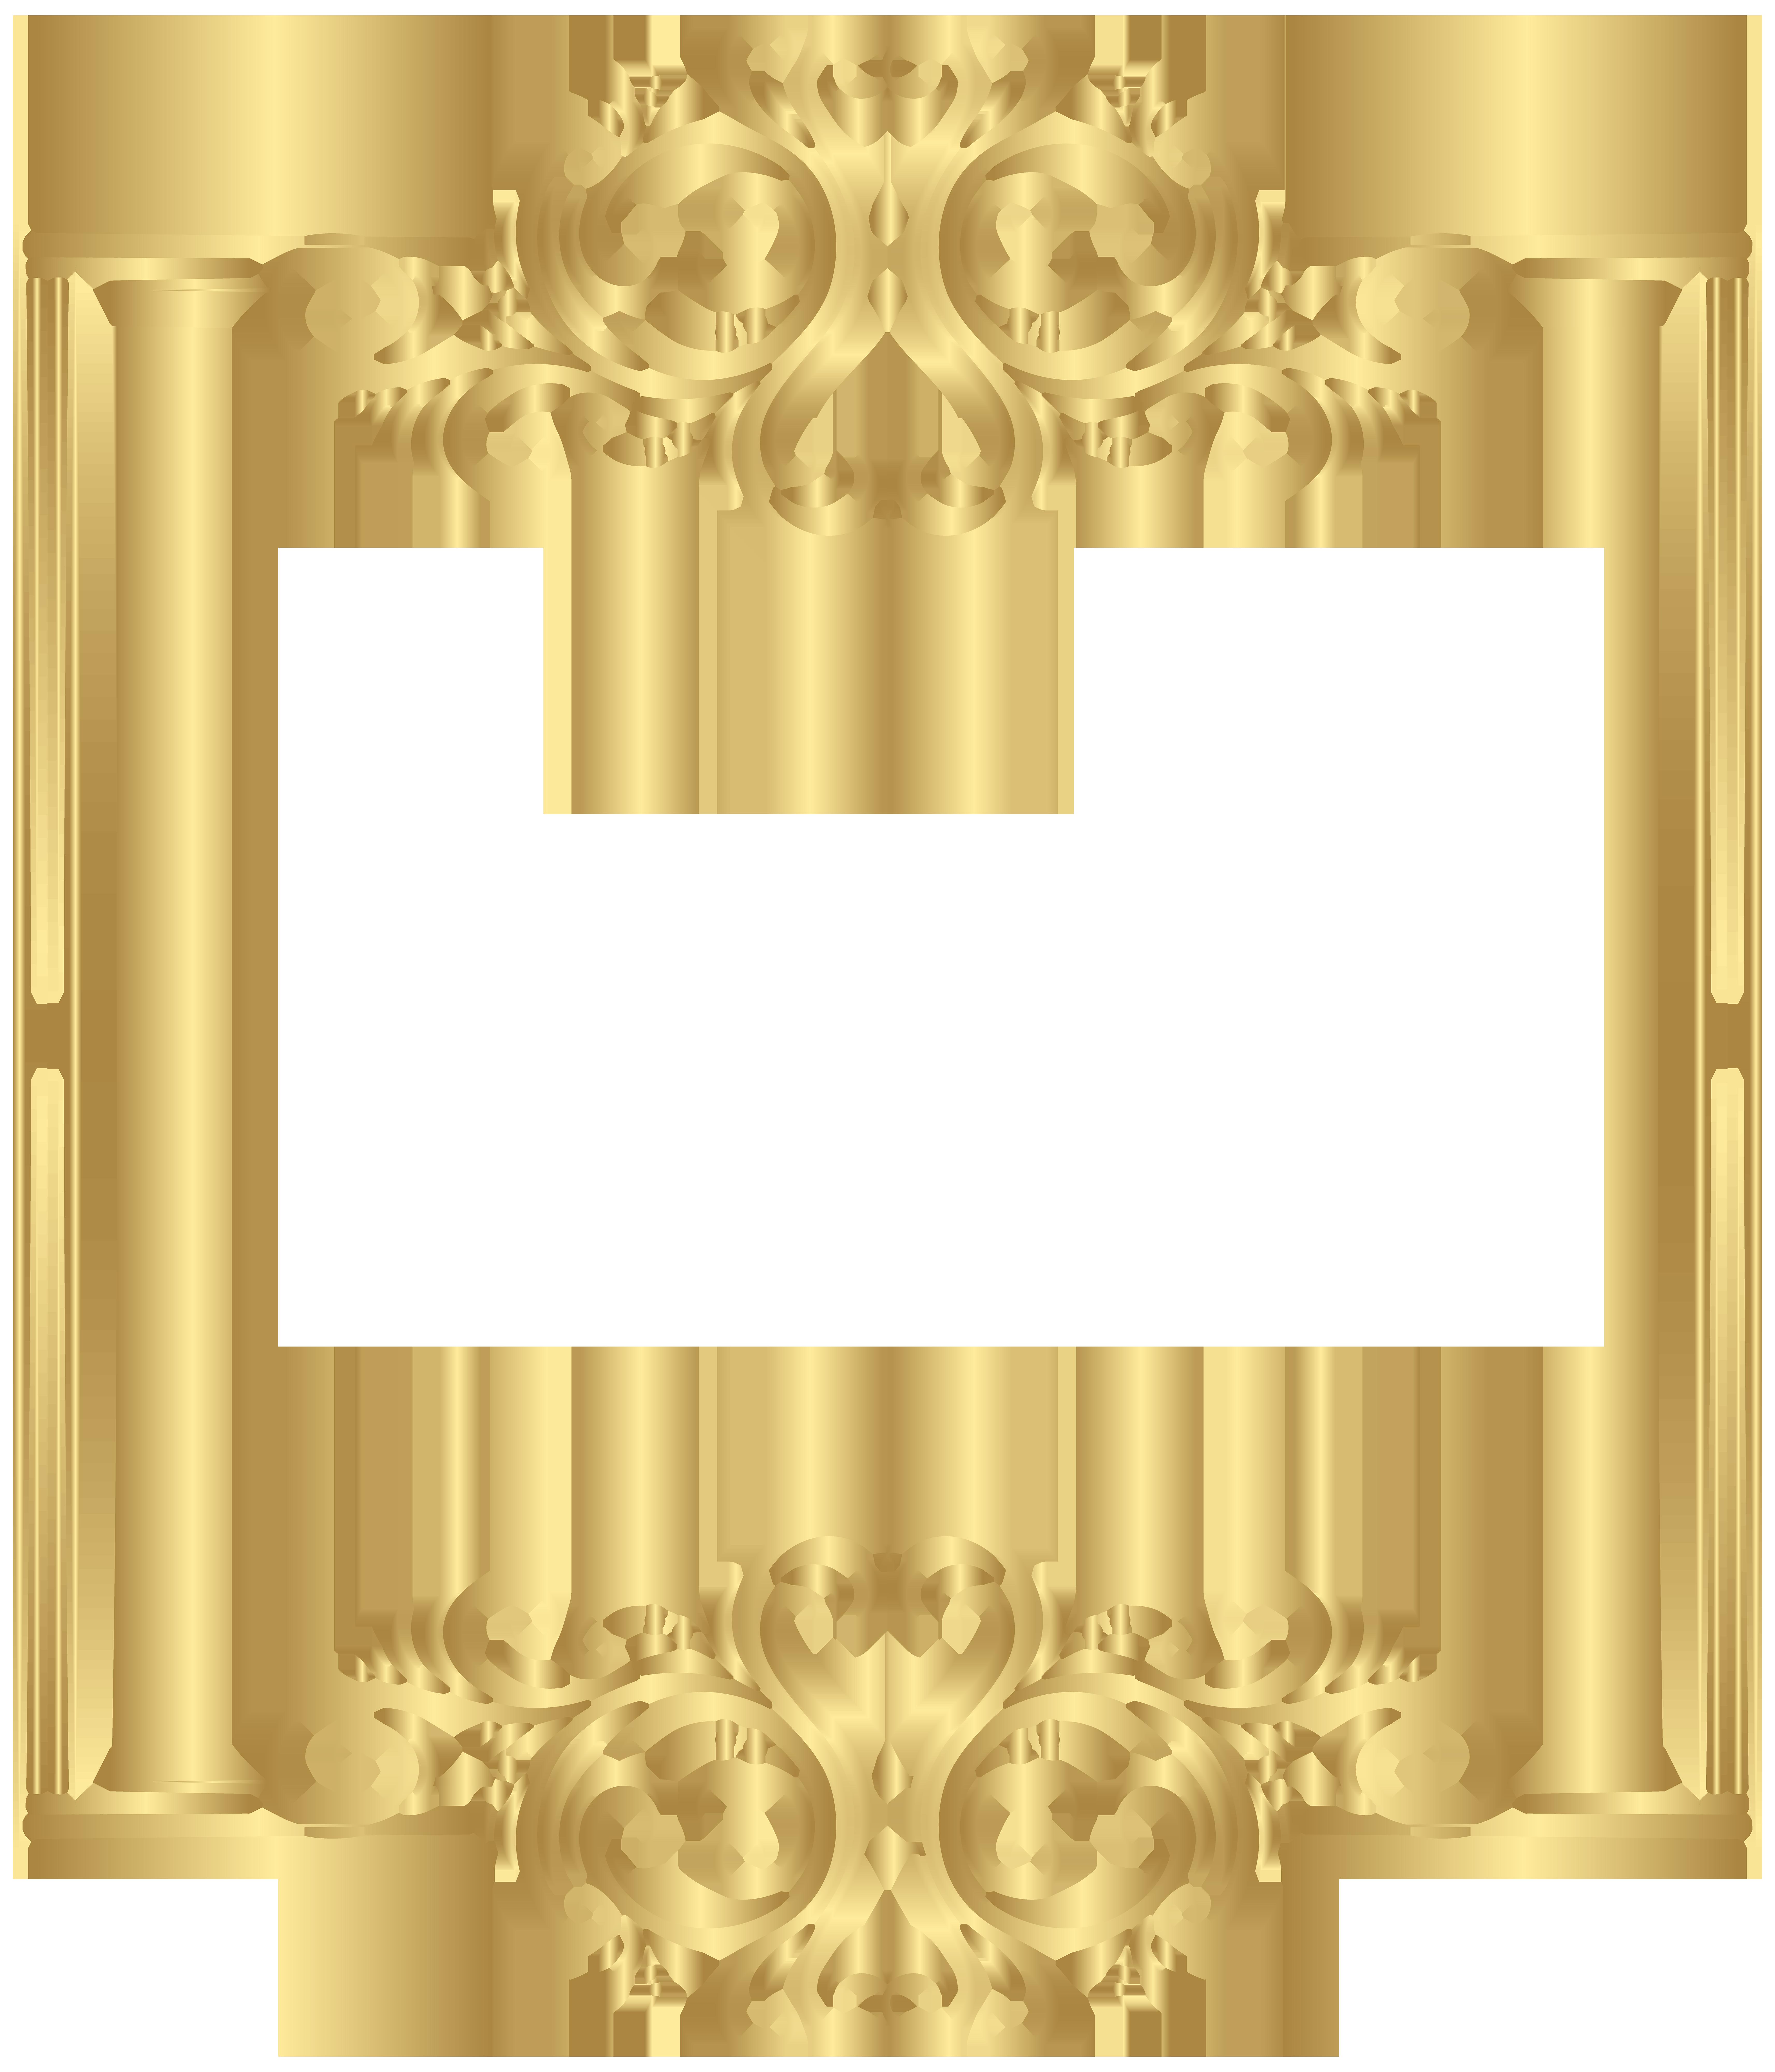 Food clipart frame. Gold border png clip